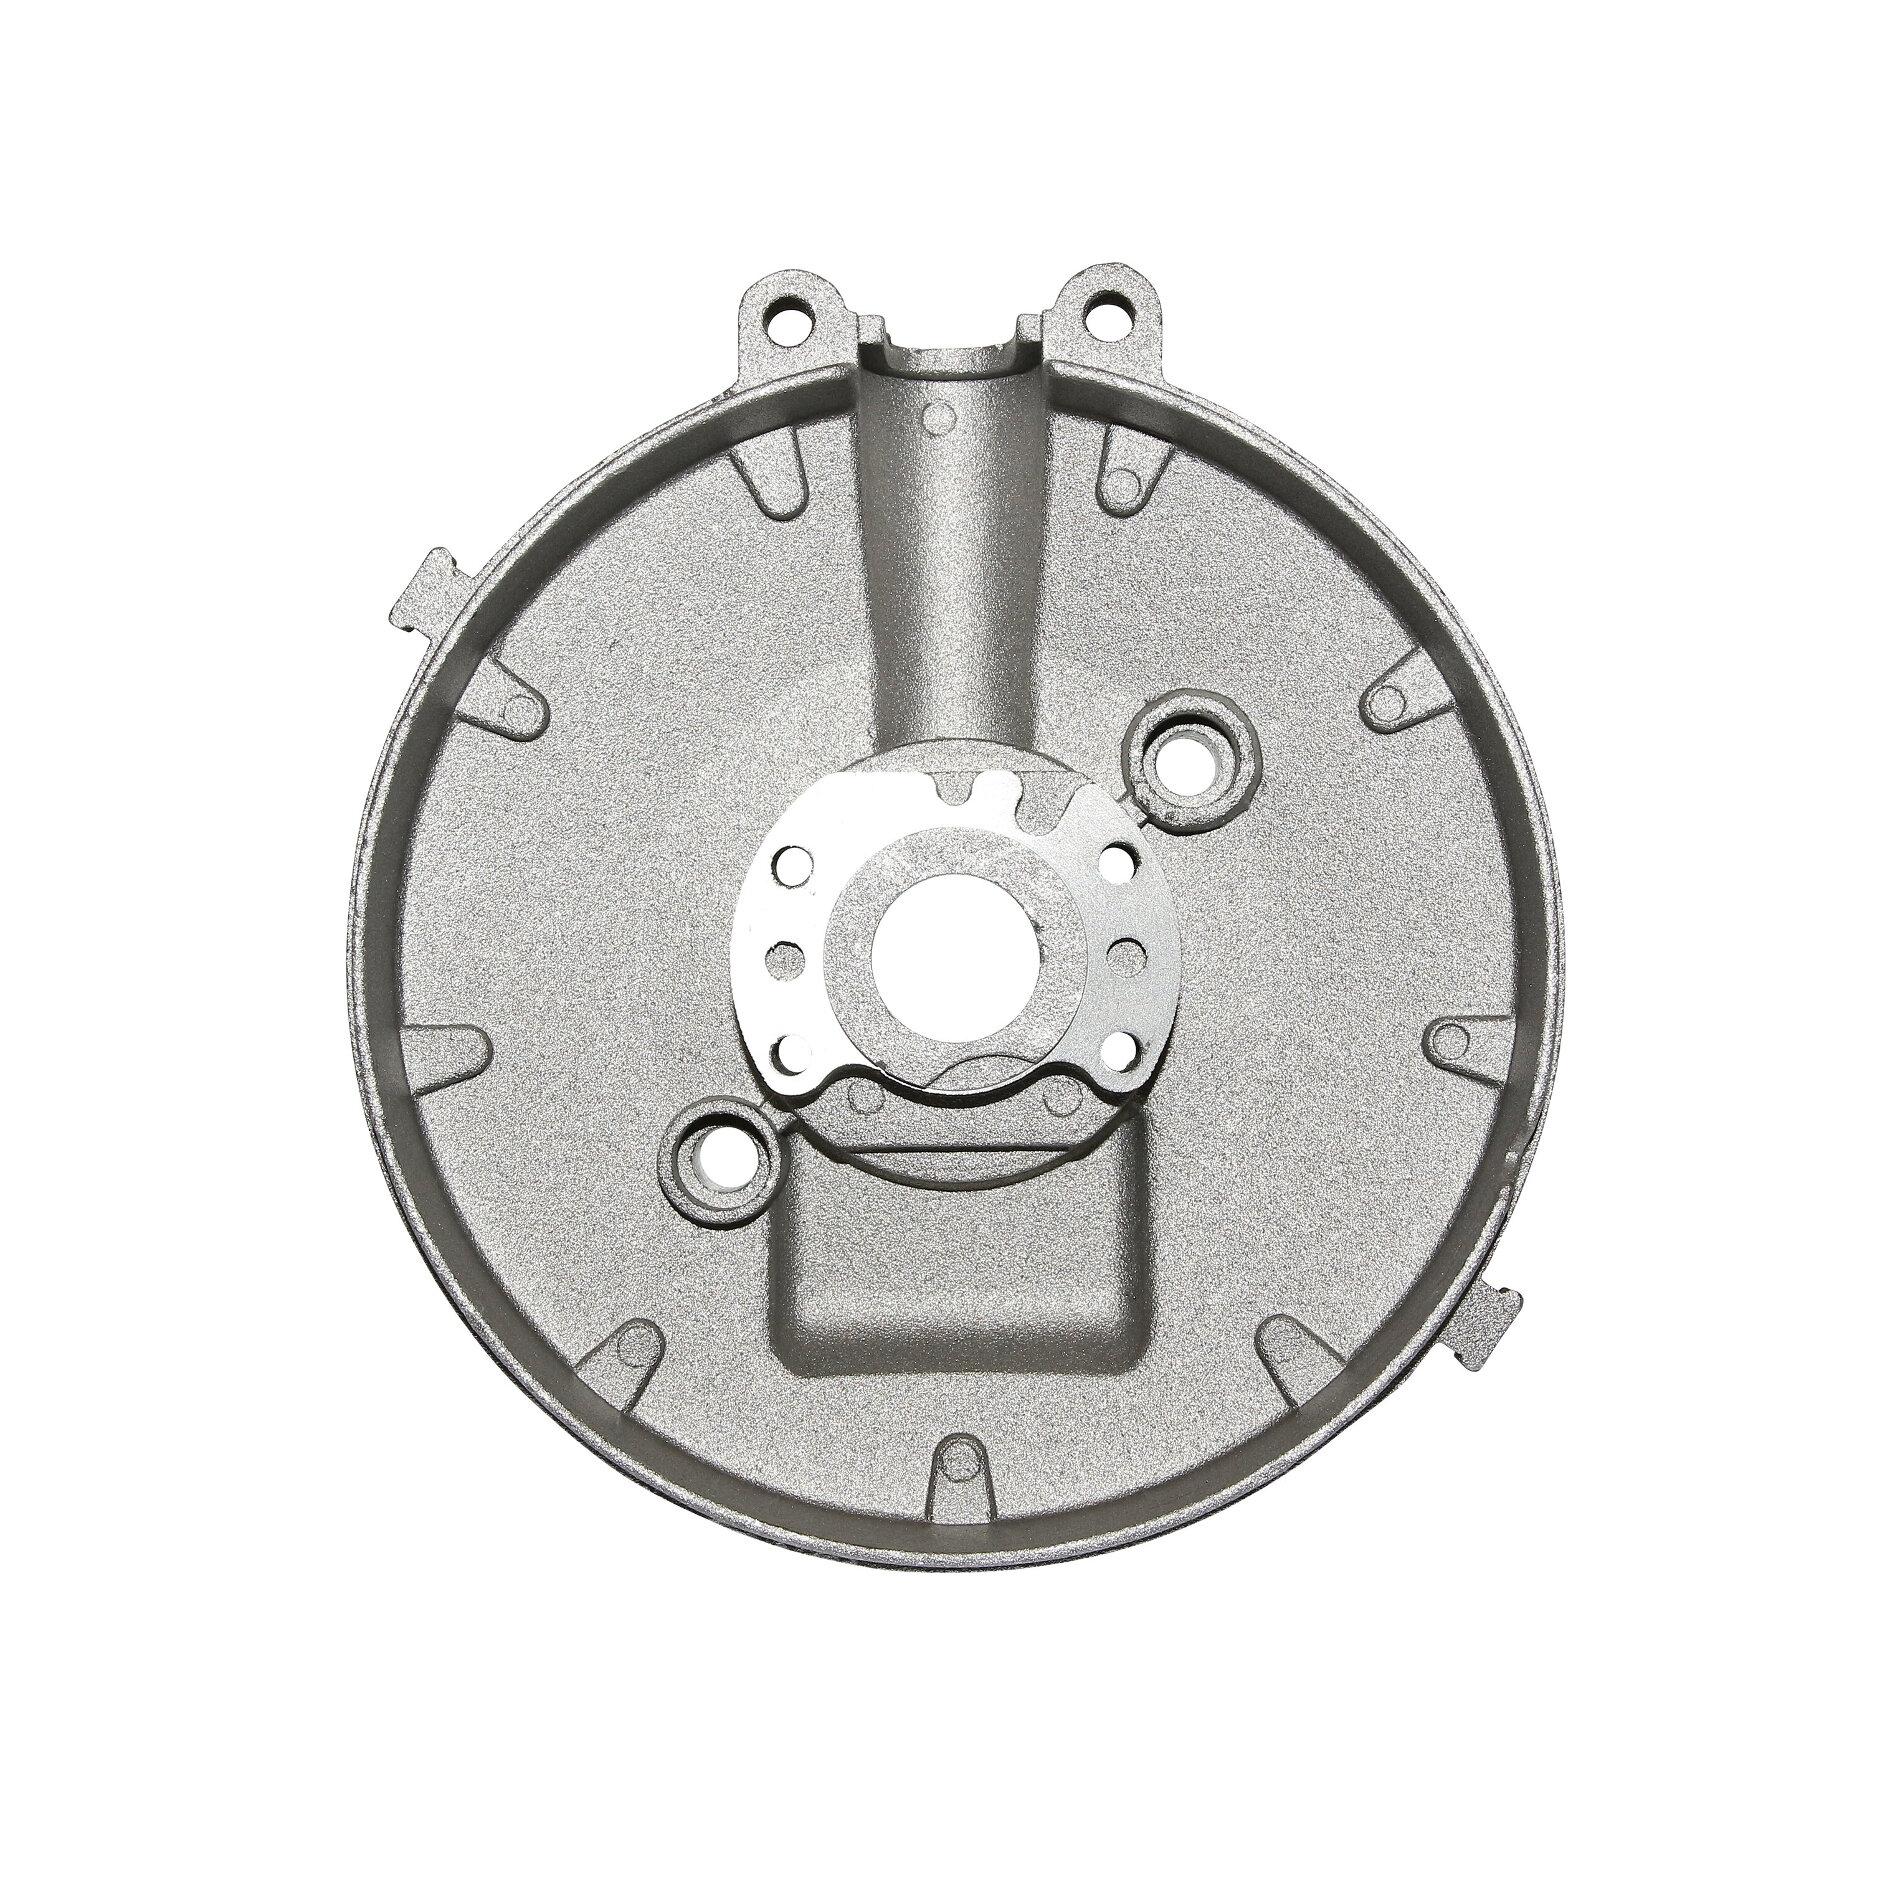 Platine d'allumage stator Peugeot 103 MVL-SP